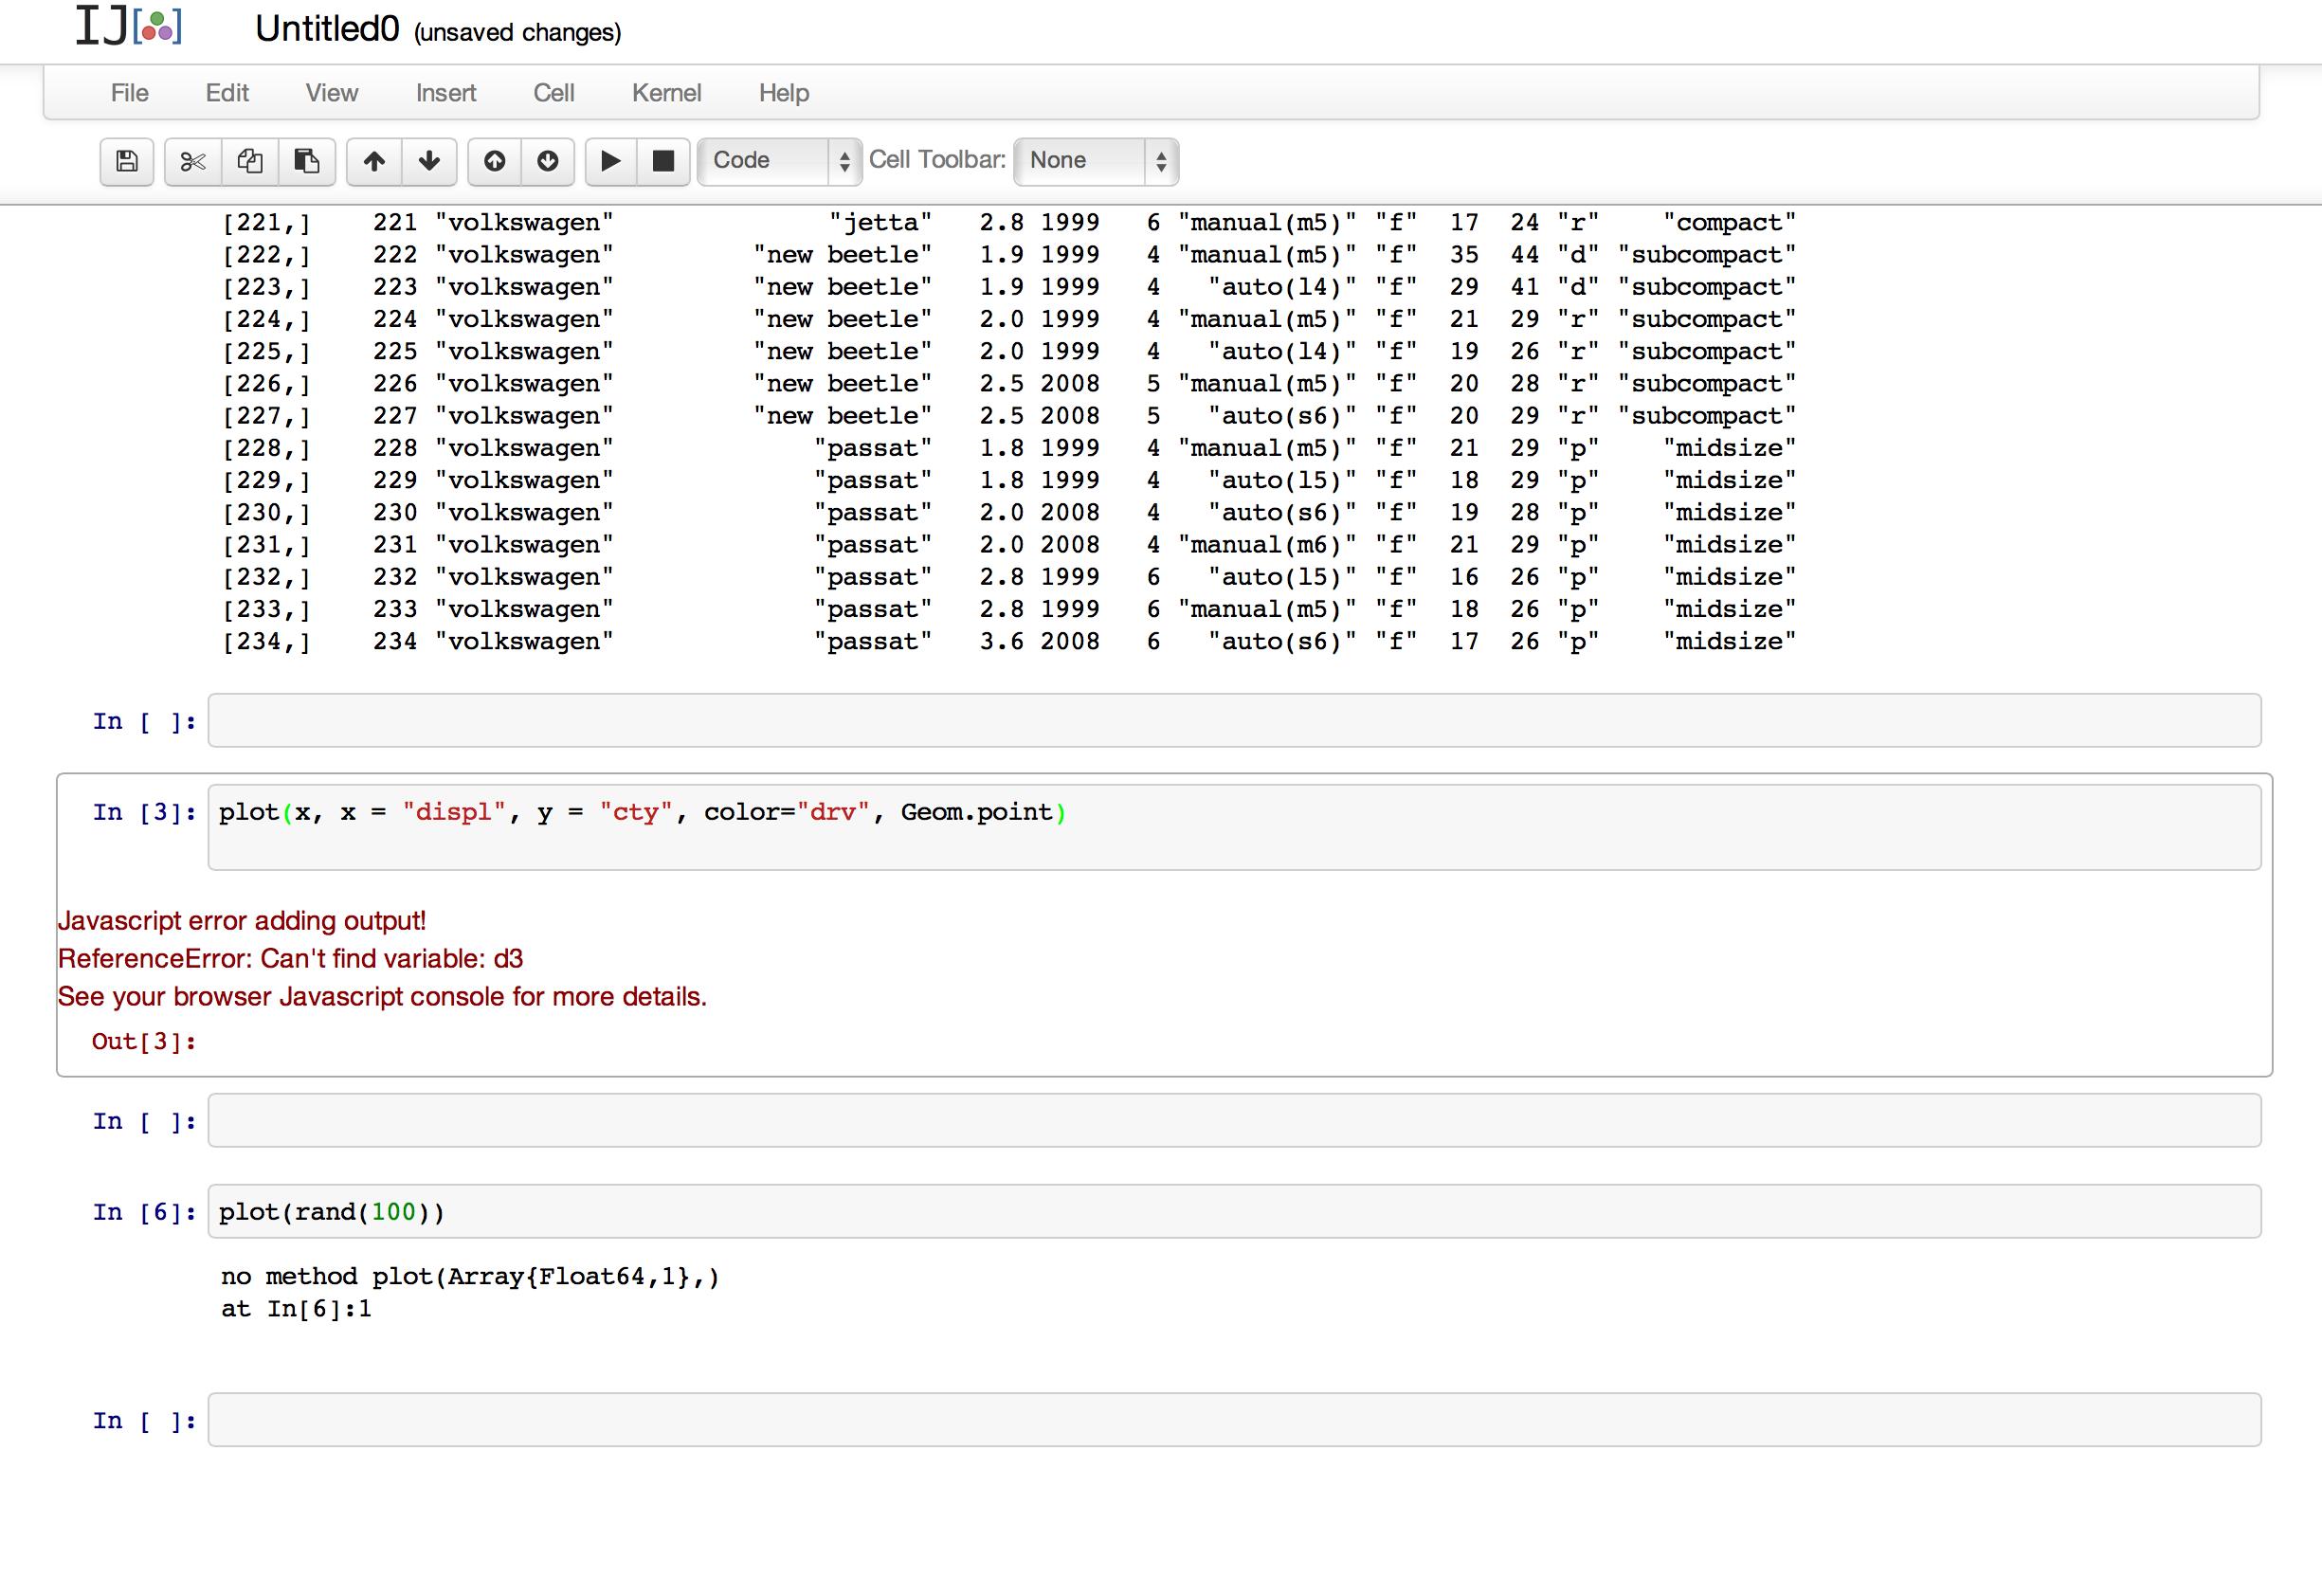 IJulia Notebook + Gadfly = javascript error? · Issue #83